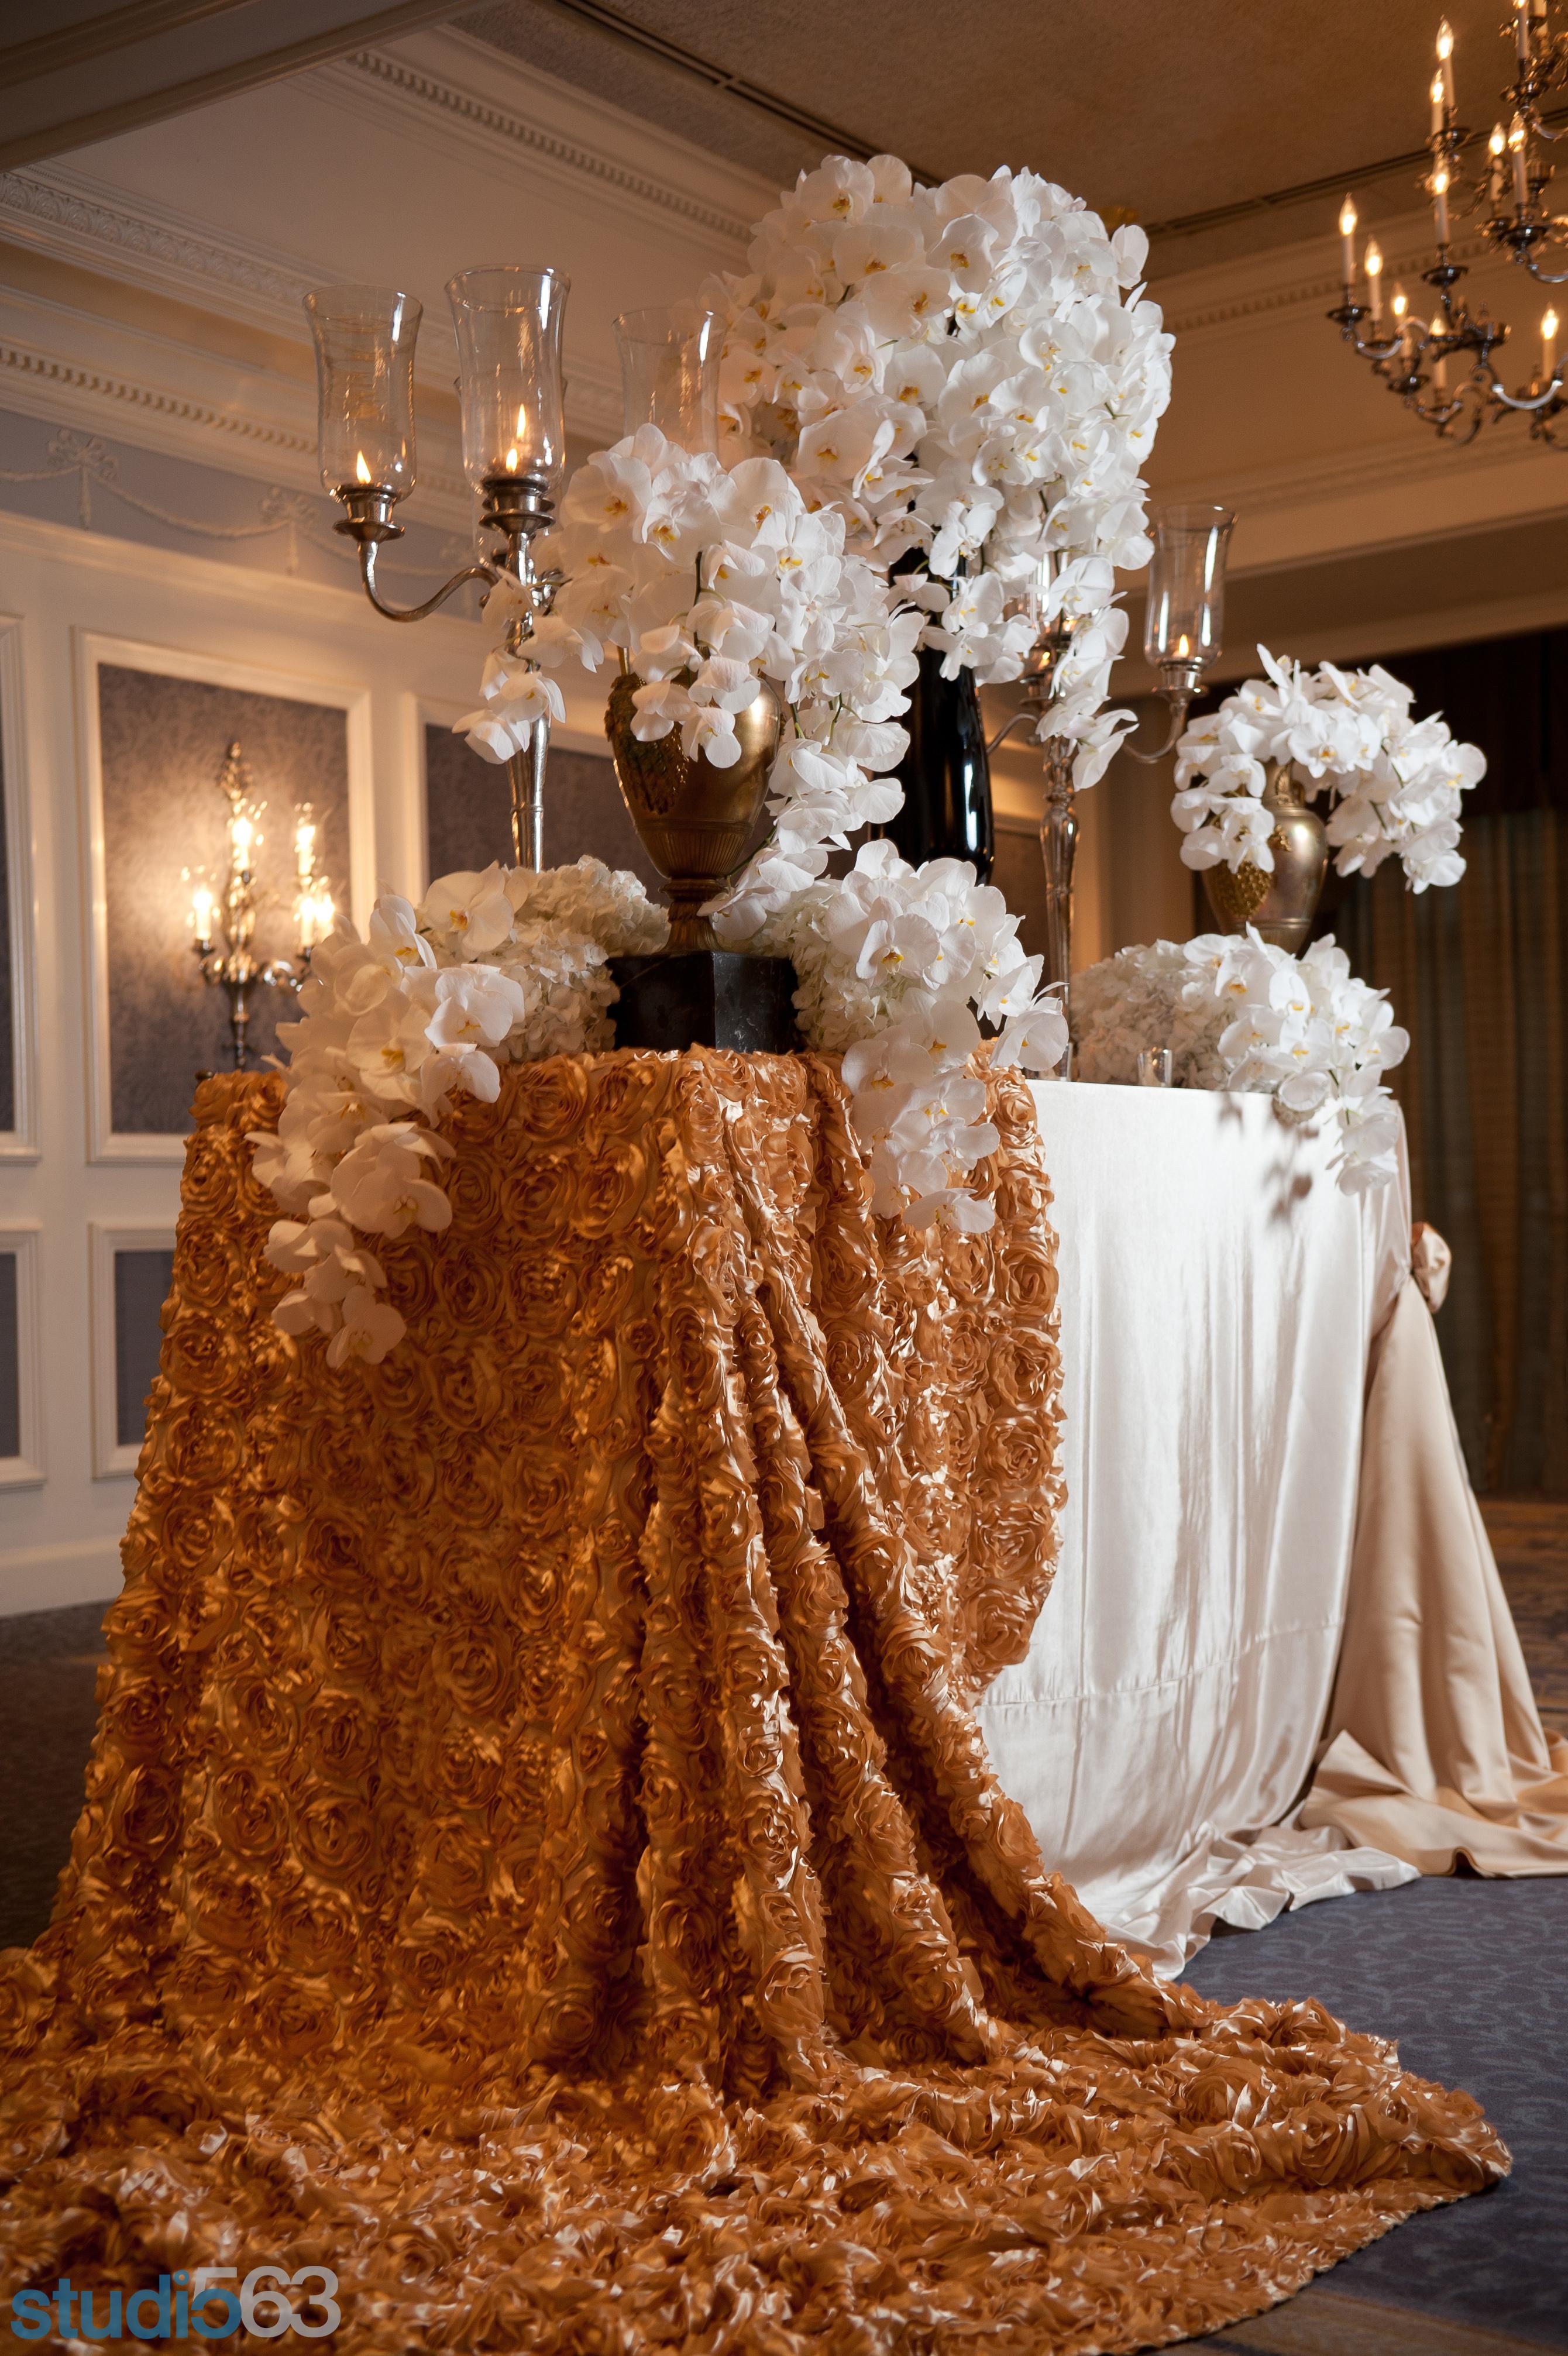 Great Renaissance Wedding Theme Images Wedding Decoration Ideas Renaissance  Wedding Theme Gallery Wedding Decoration Ideas Renaissance Wedding